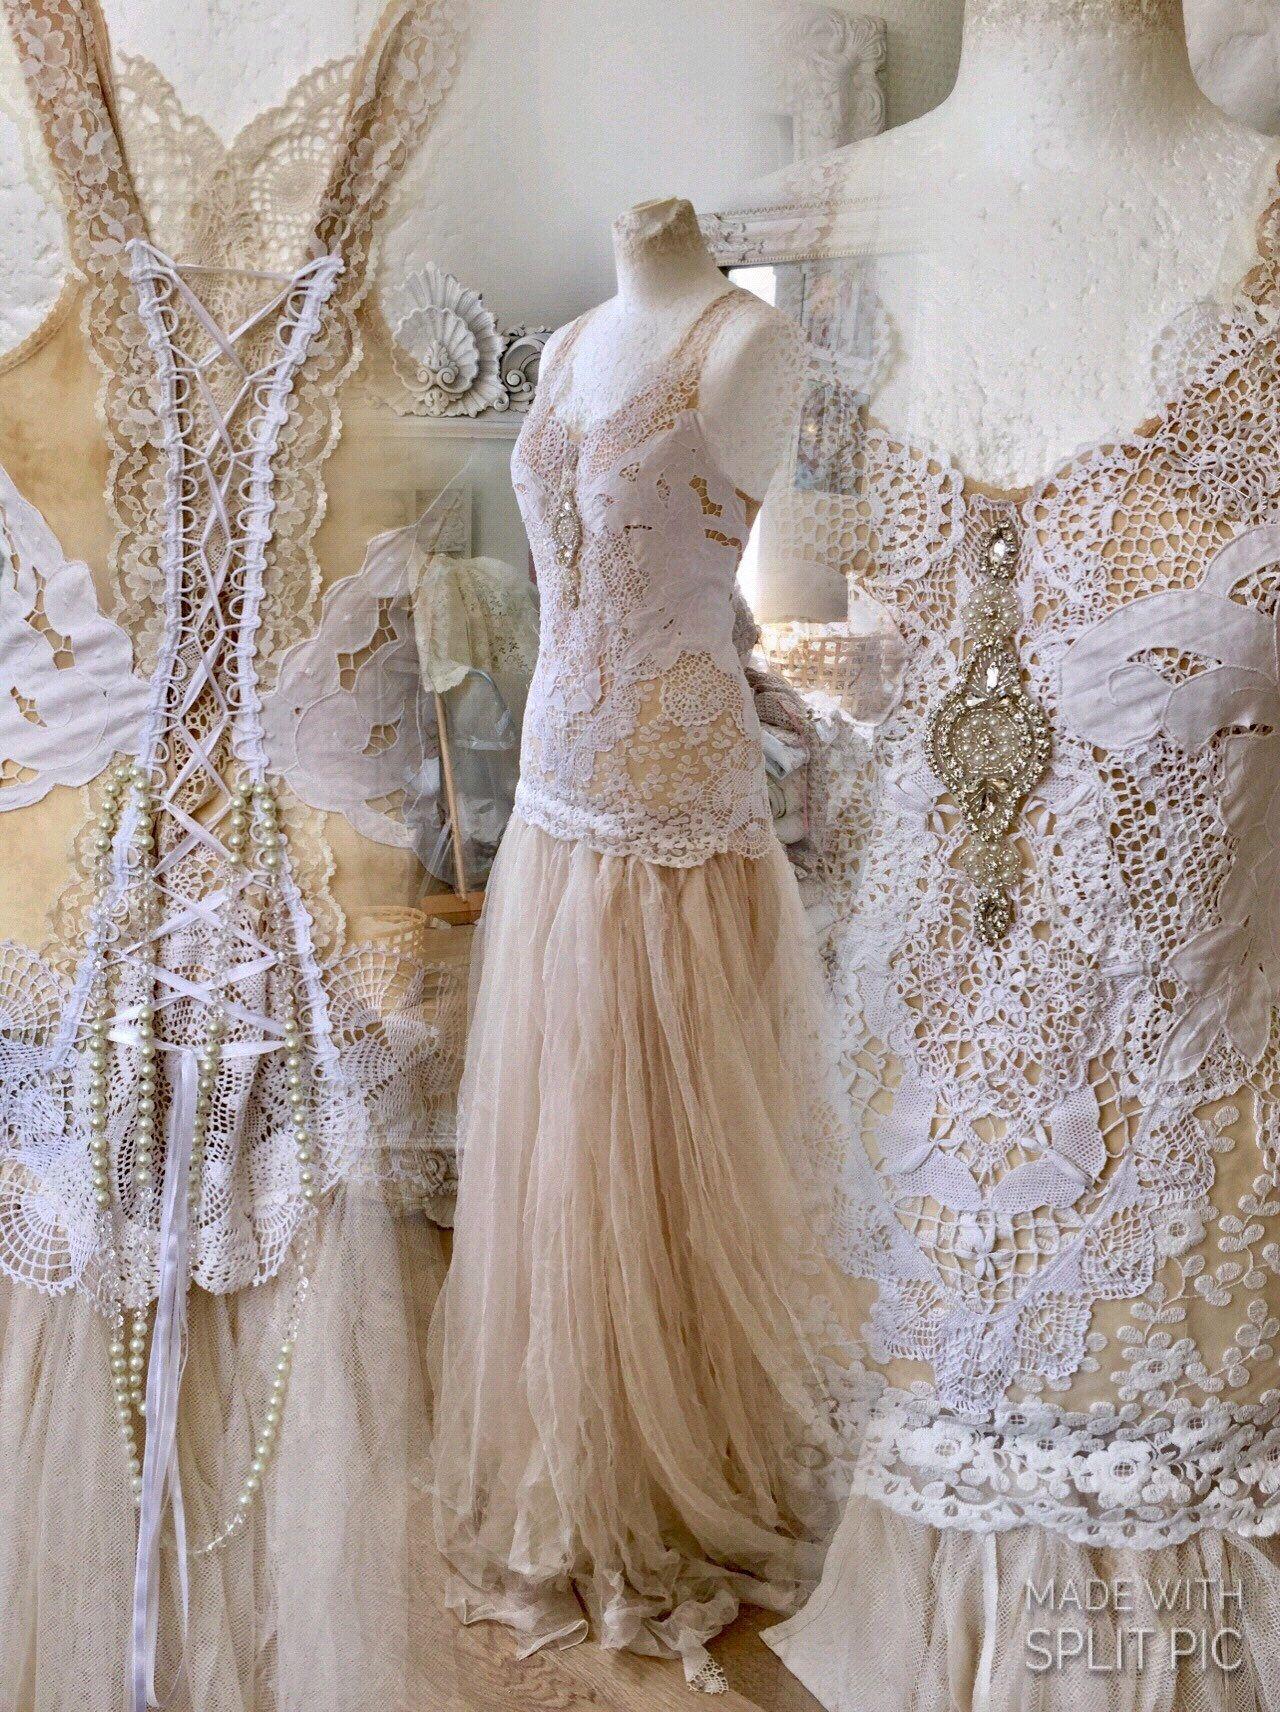 Bridal gown tea stainedwedding dress delicatebohemian wedding